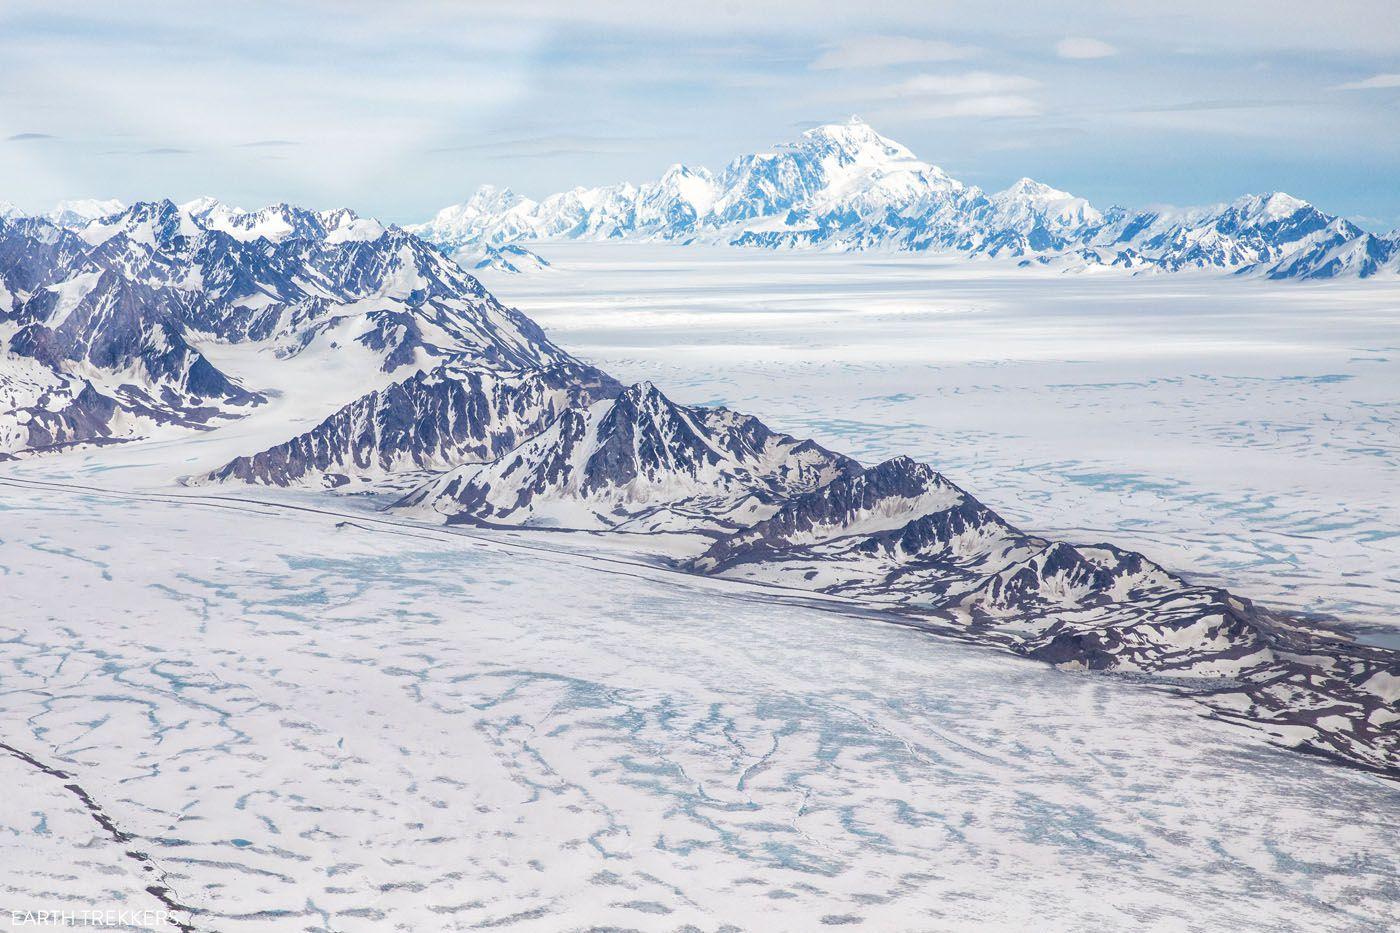 Bagley Icefield Mount St Elias